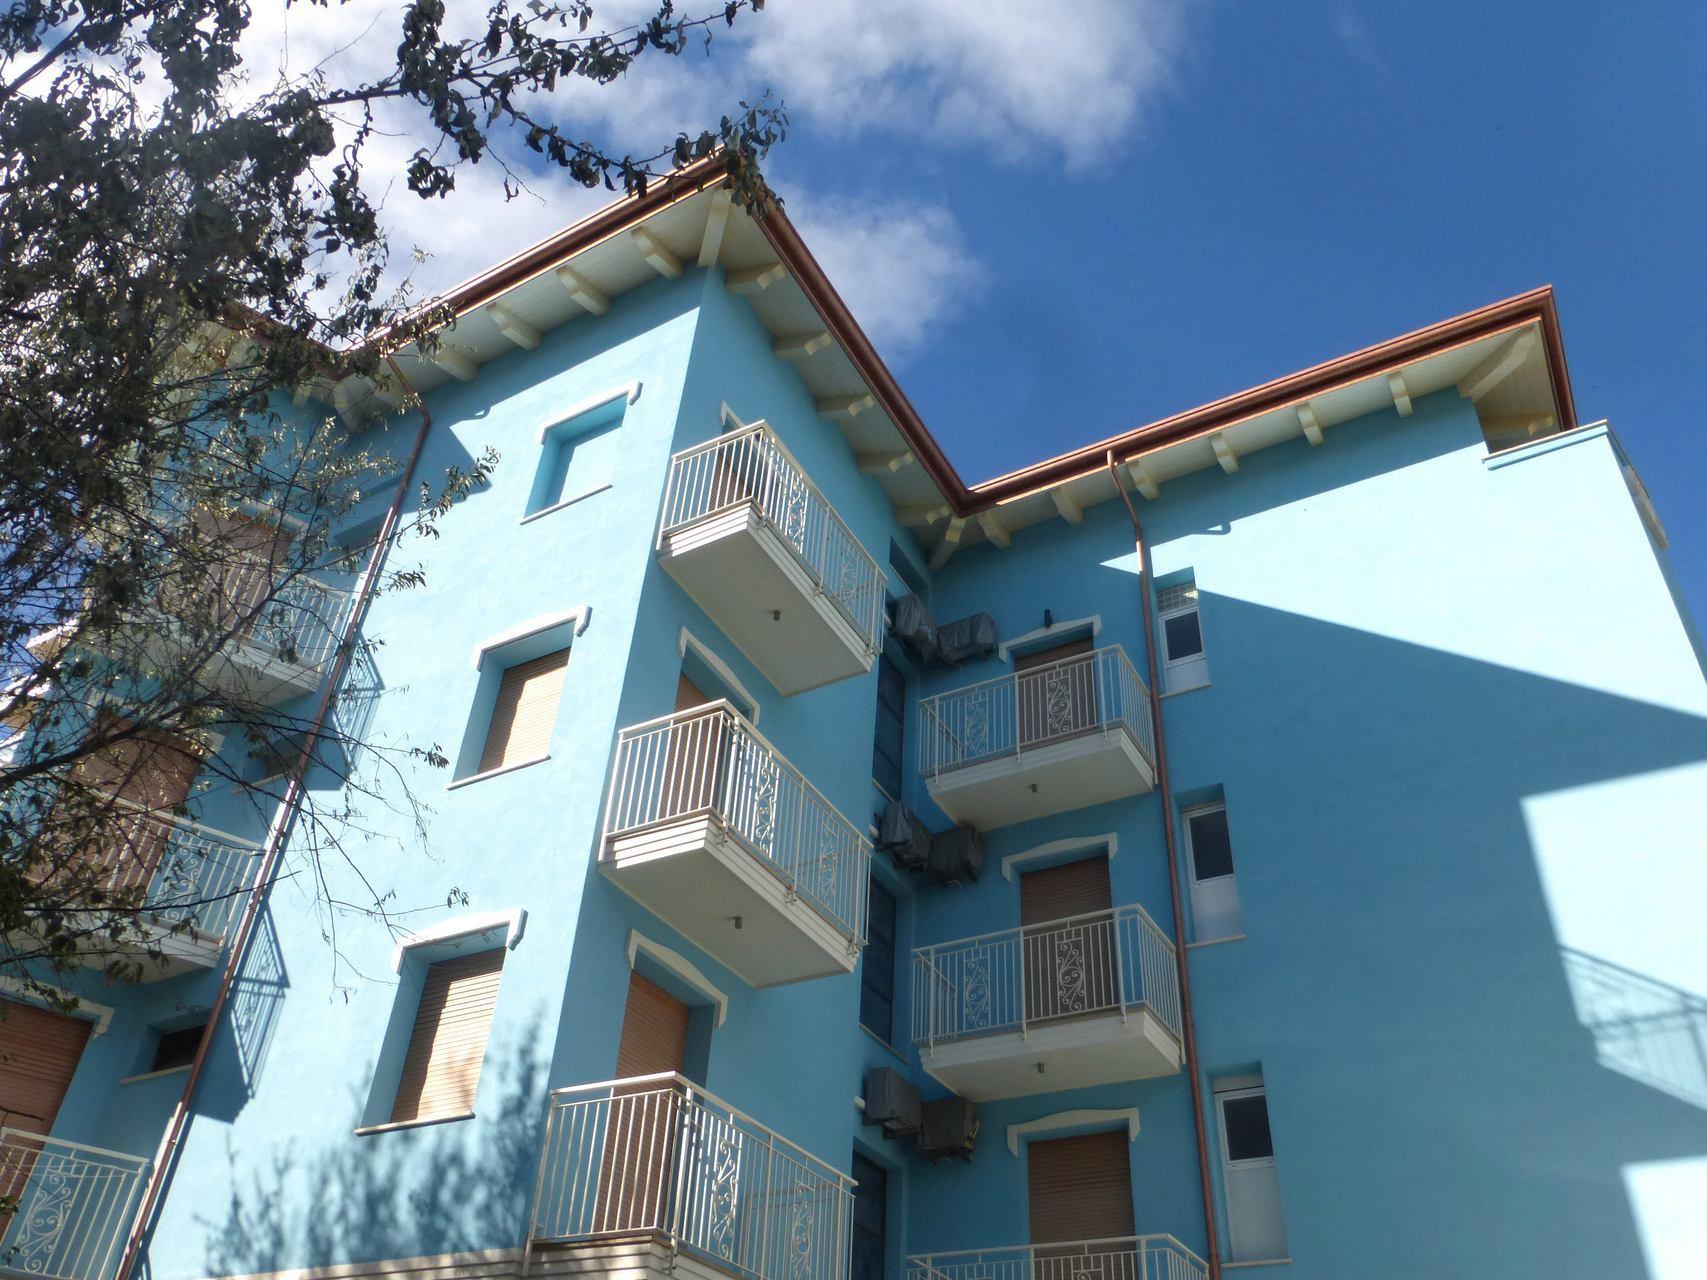 Igea Perla Hotel Cooperando La Marina – Bellaria lwOZTPiXku